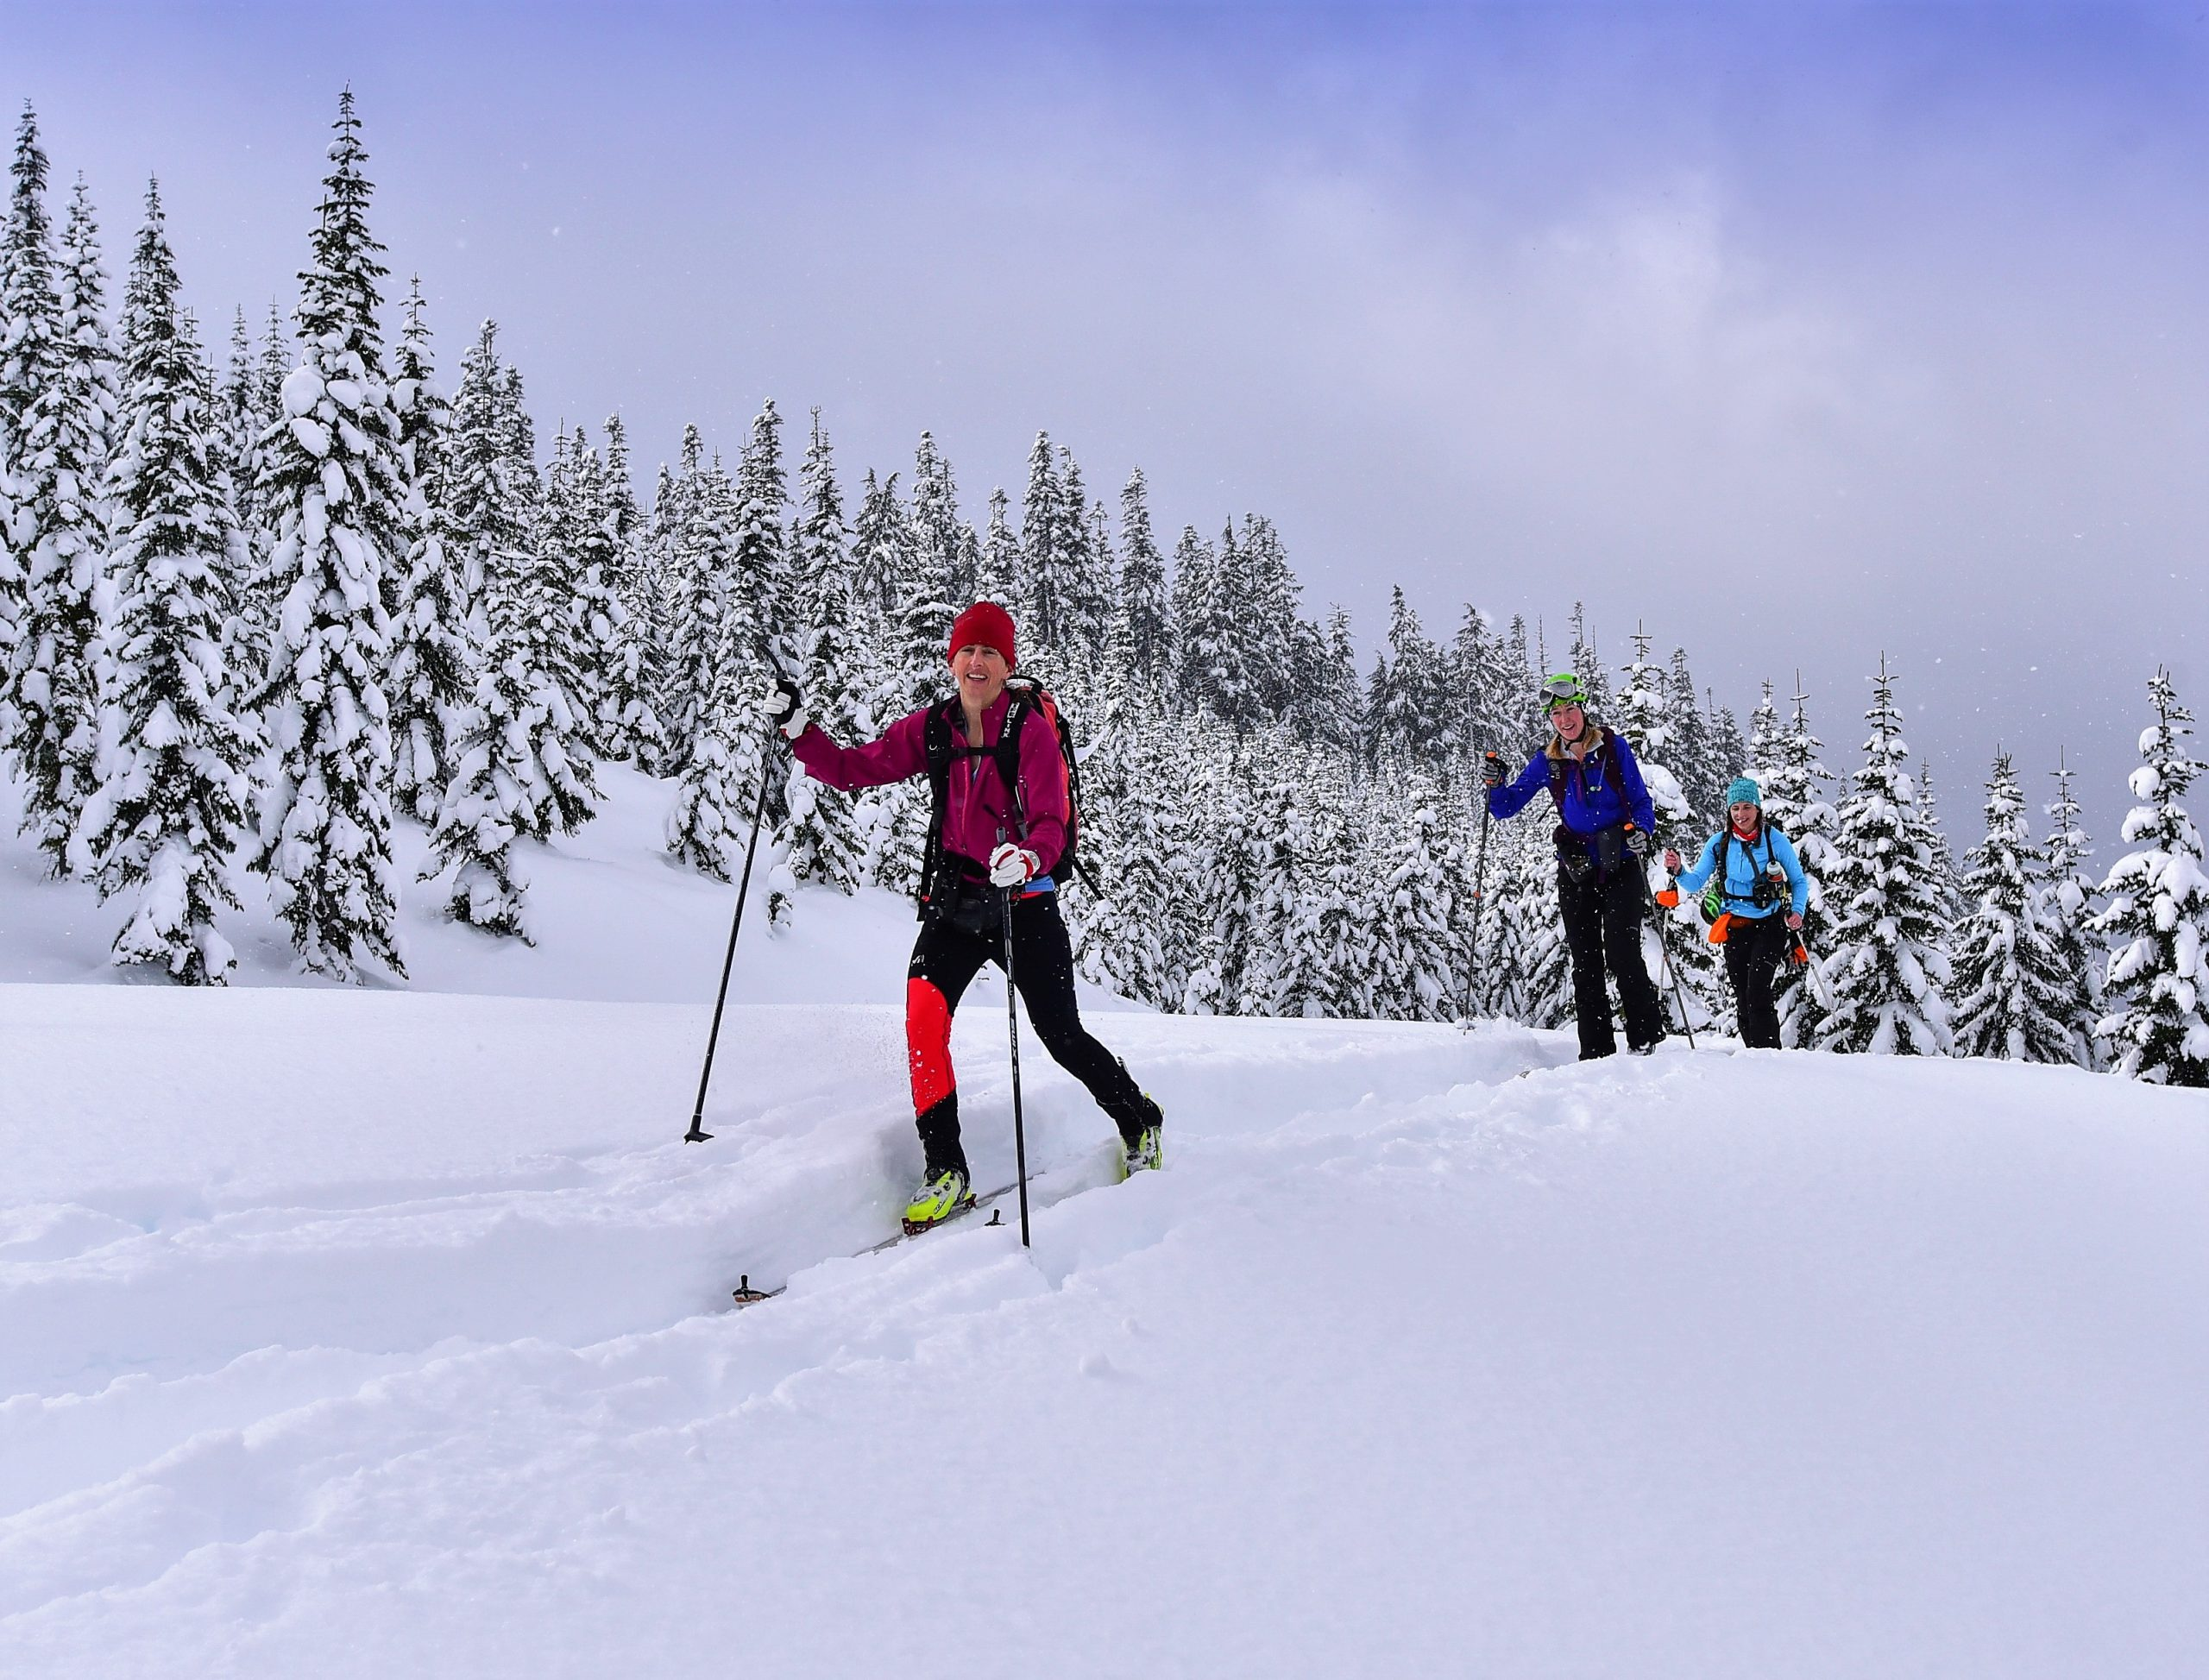 Esquí de fondo en Geilo. Noruega. (8 días)